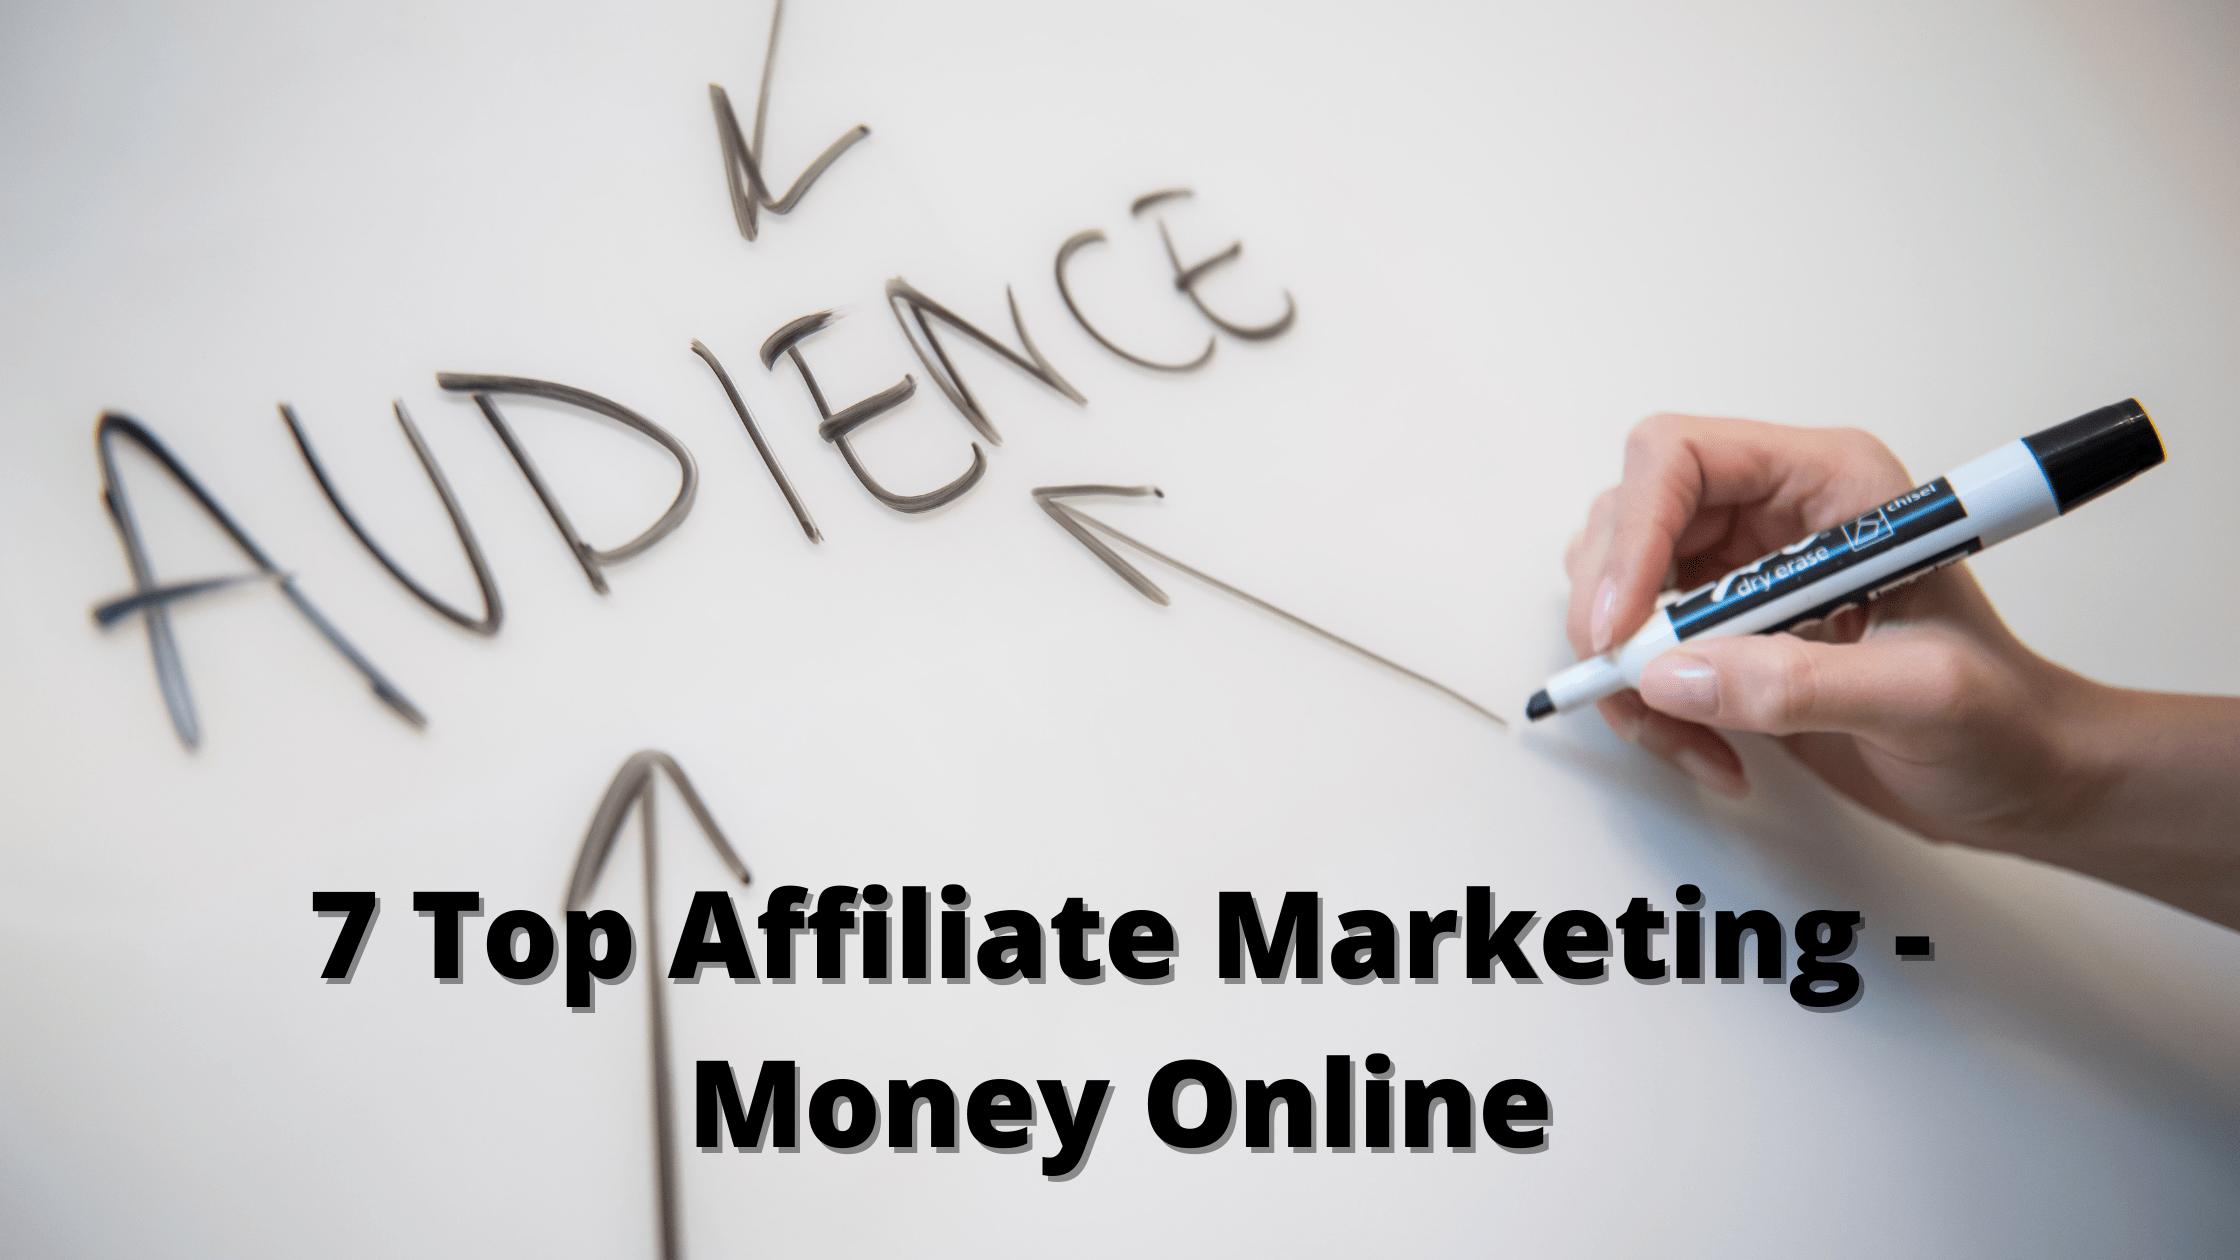 7 Top Affiliate Marketing Strategies for Earning Money Online